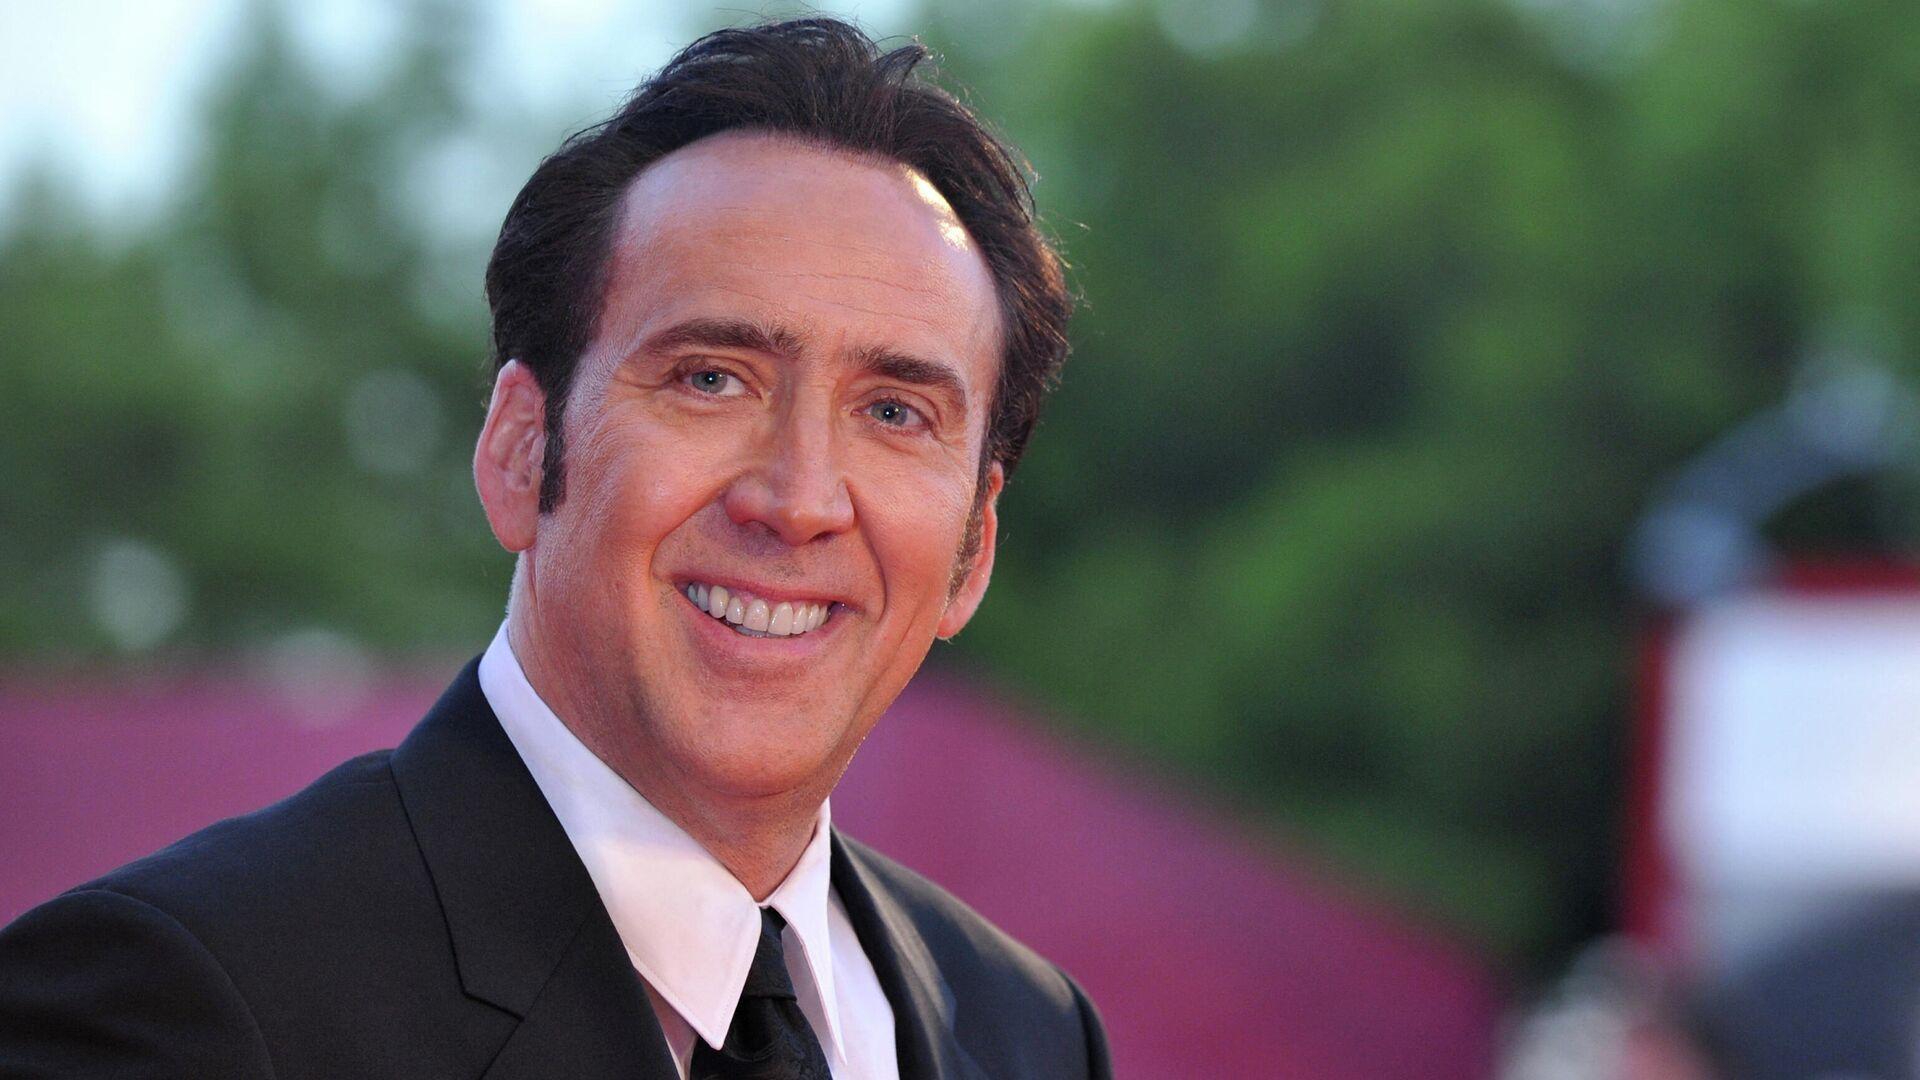 Nicolas Cage  - SNA, 1920, 24.09.2021